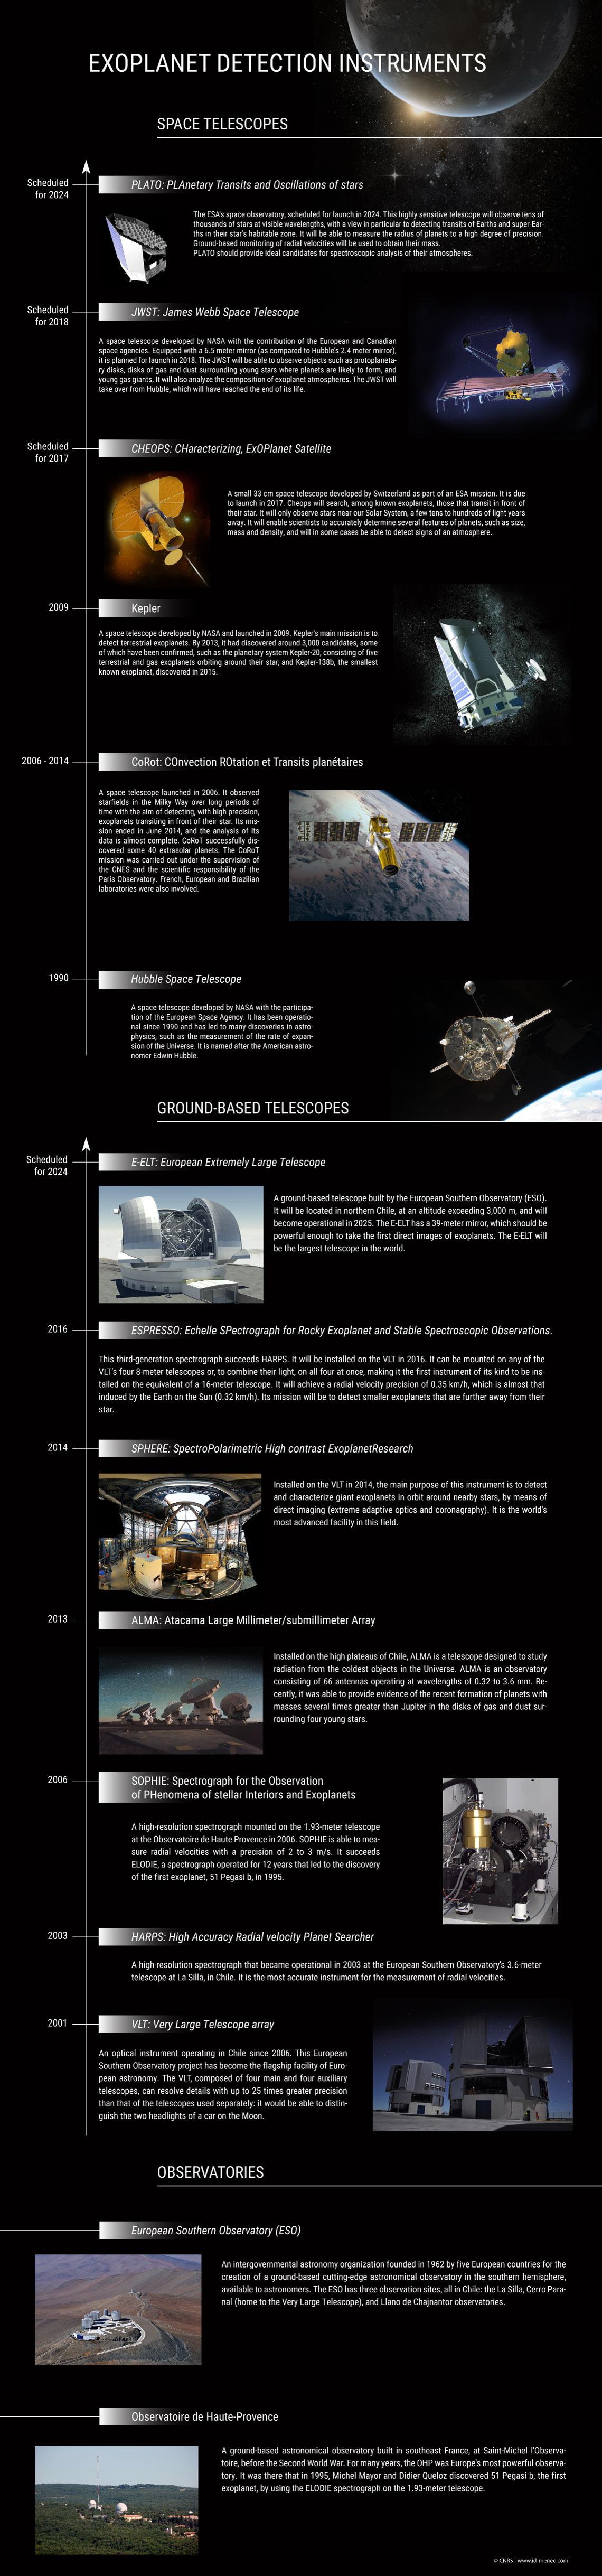 http://sagascience.com/exoplanetes/wp-content/uploads/2016/06/instruments_anglais.jpg